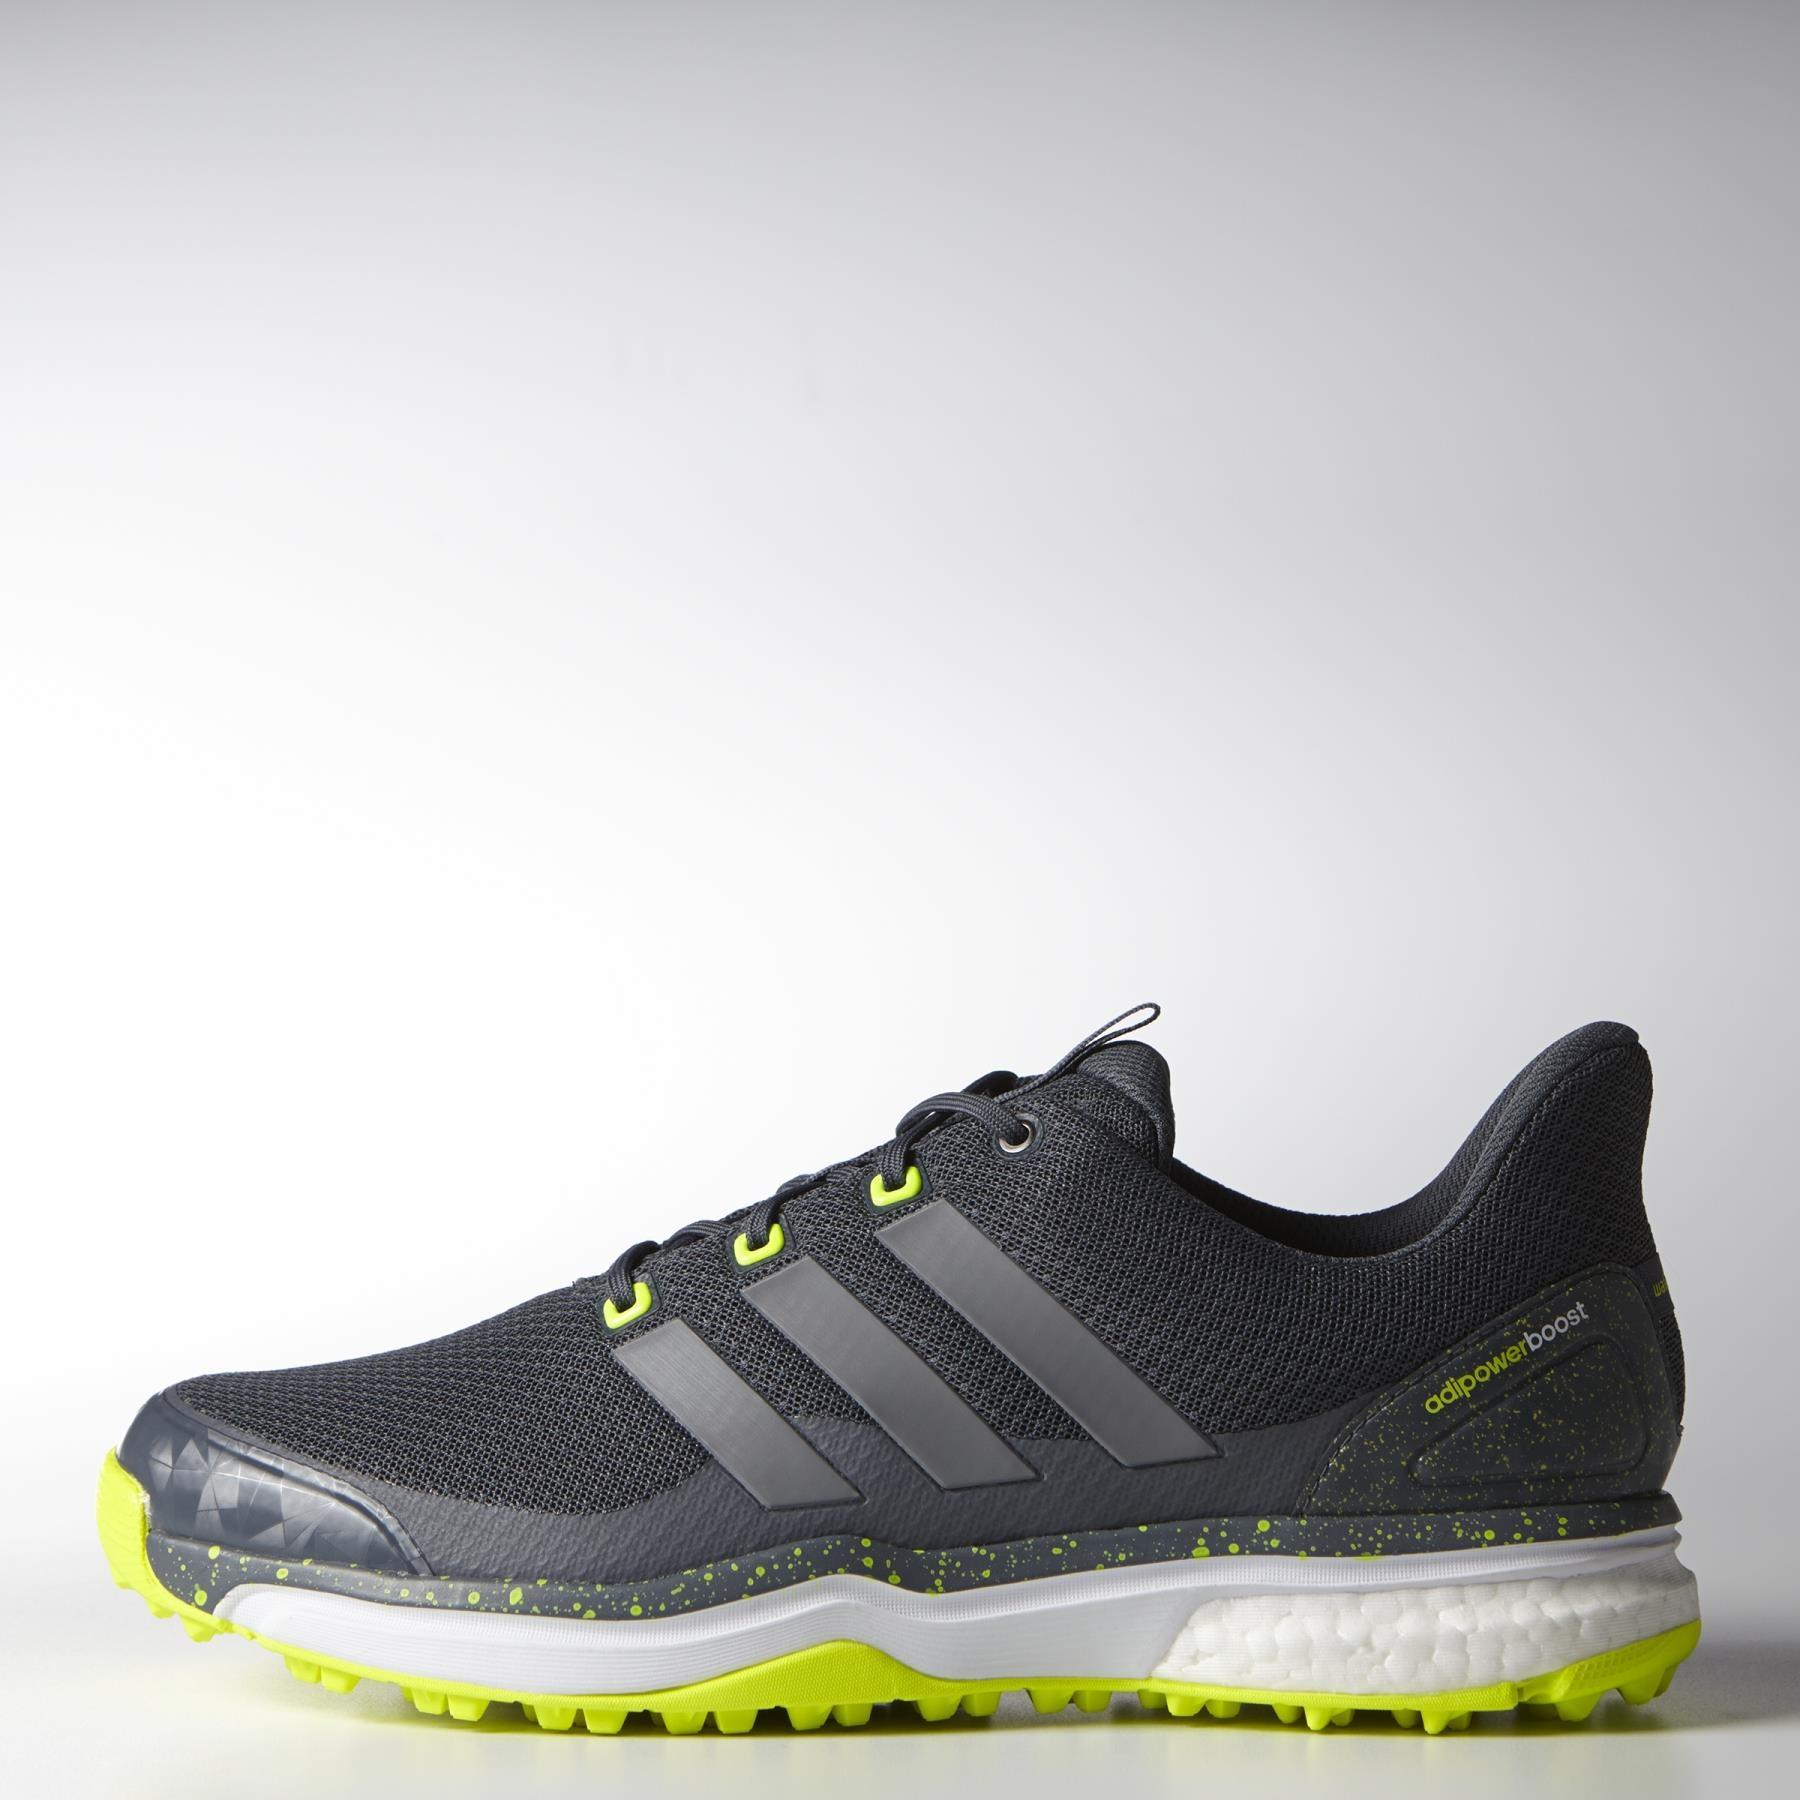 adidas AdiPower Sport Boost 2 Onix/Solar Golf Shoe - Medium Width